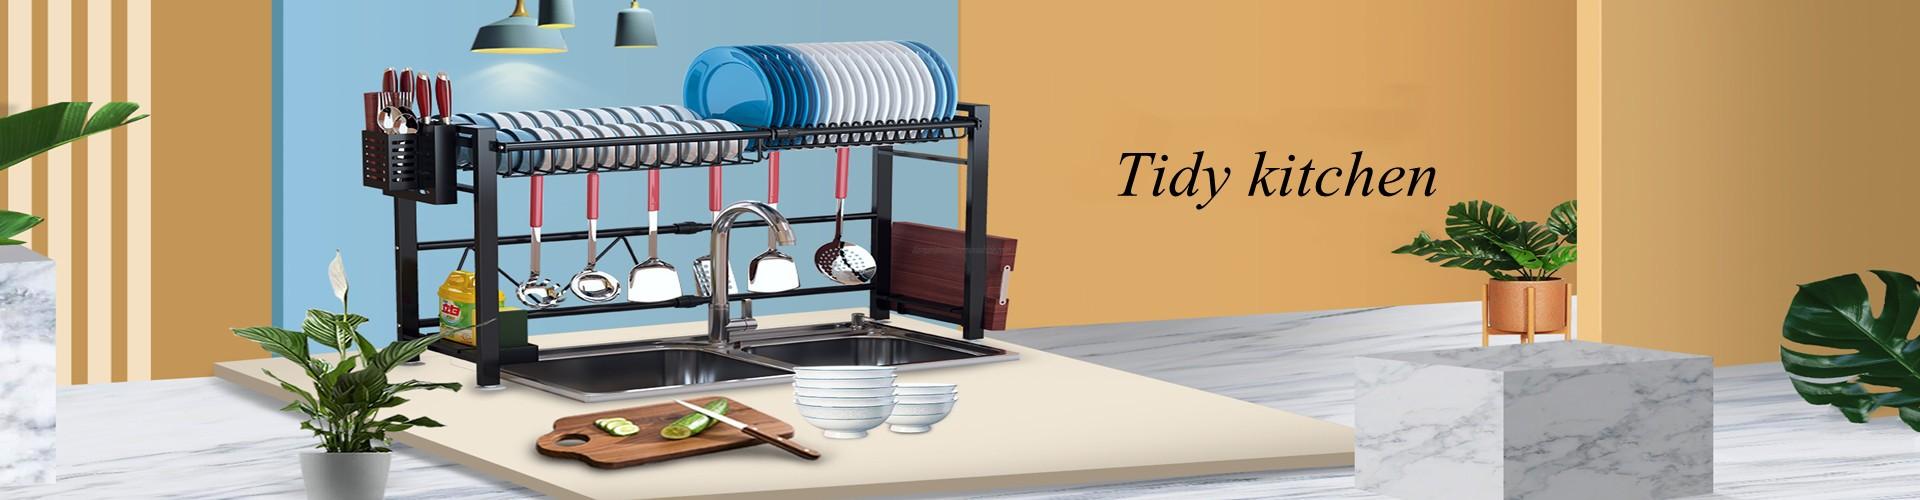 Magnetic Fridge Organizer Paper Towel Holder